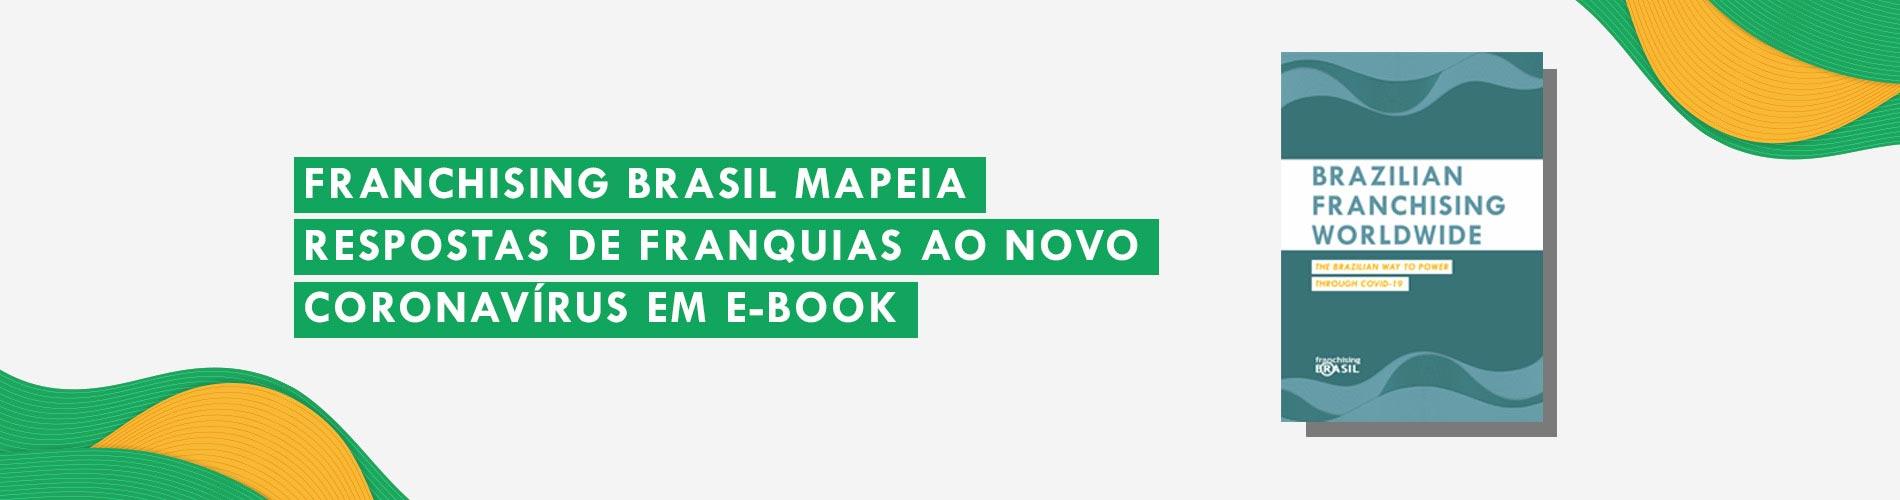 franchising-brasil-ebook-port02